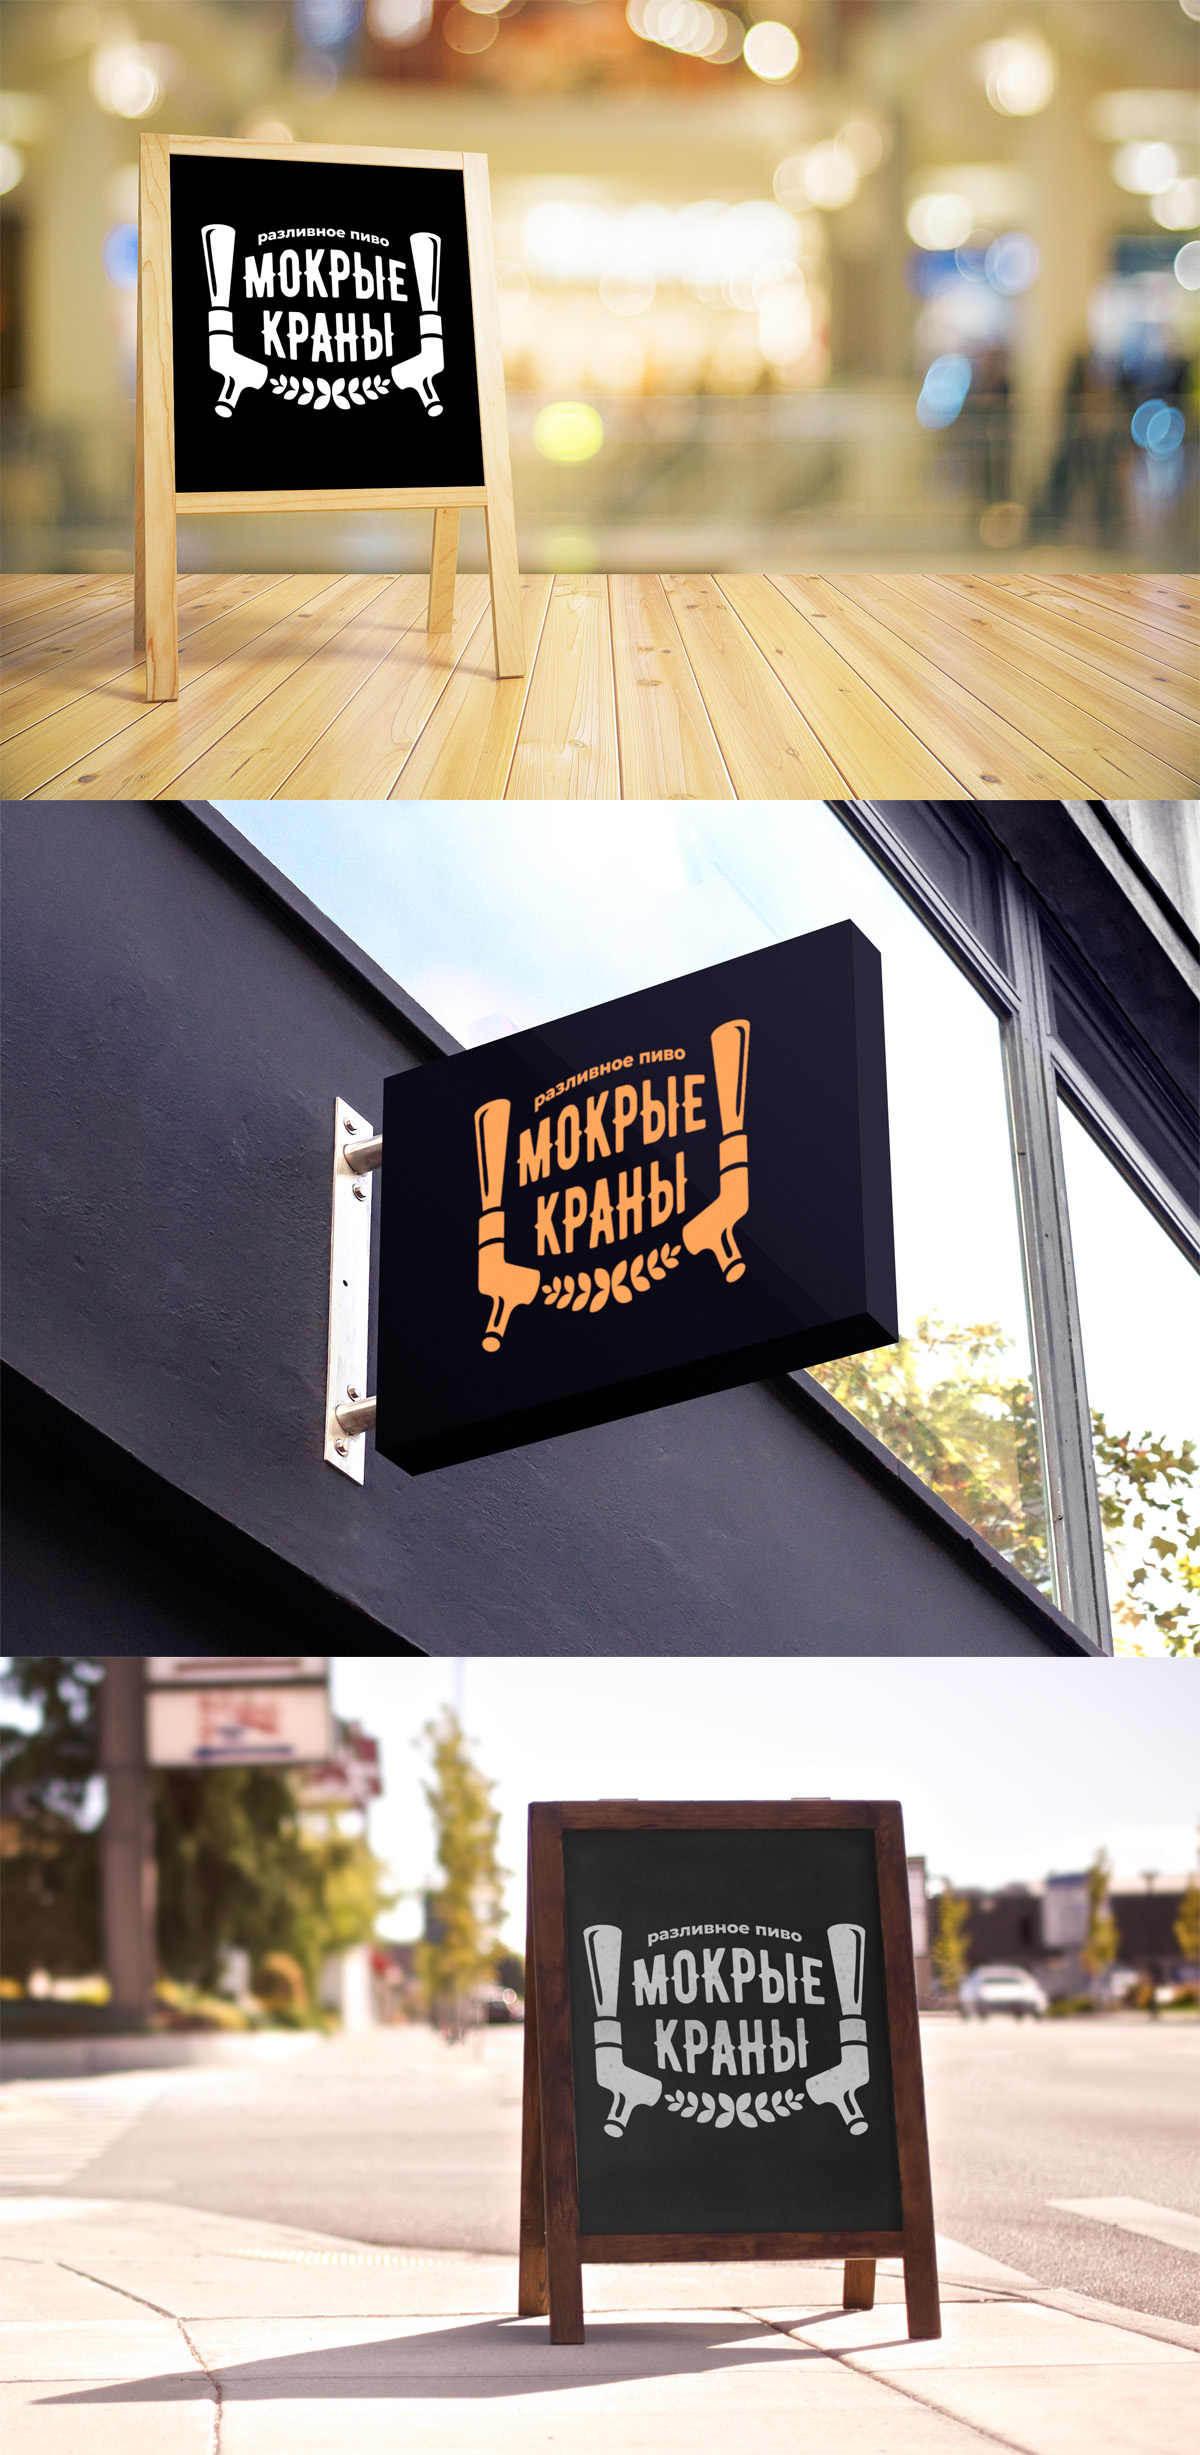 Вывеска/логотип для пивного магазина фото f_115602bd0fbc7455.jpg